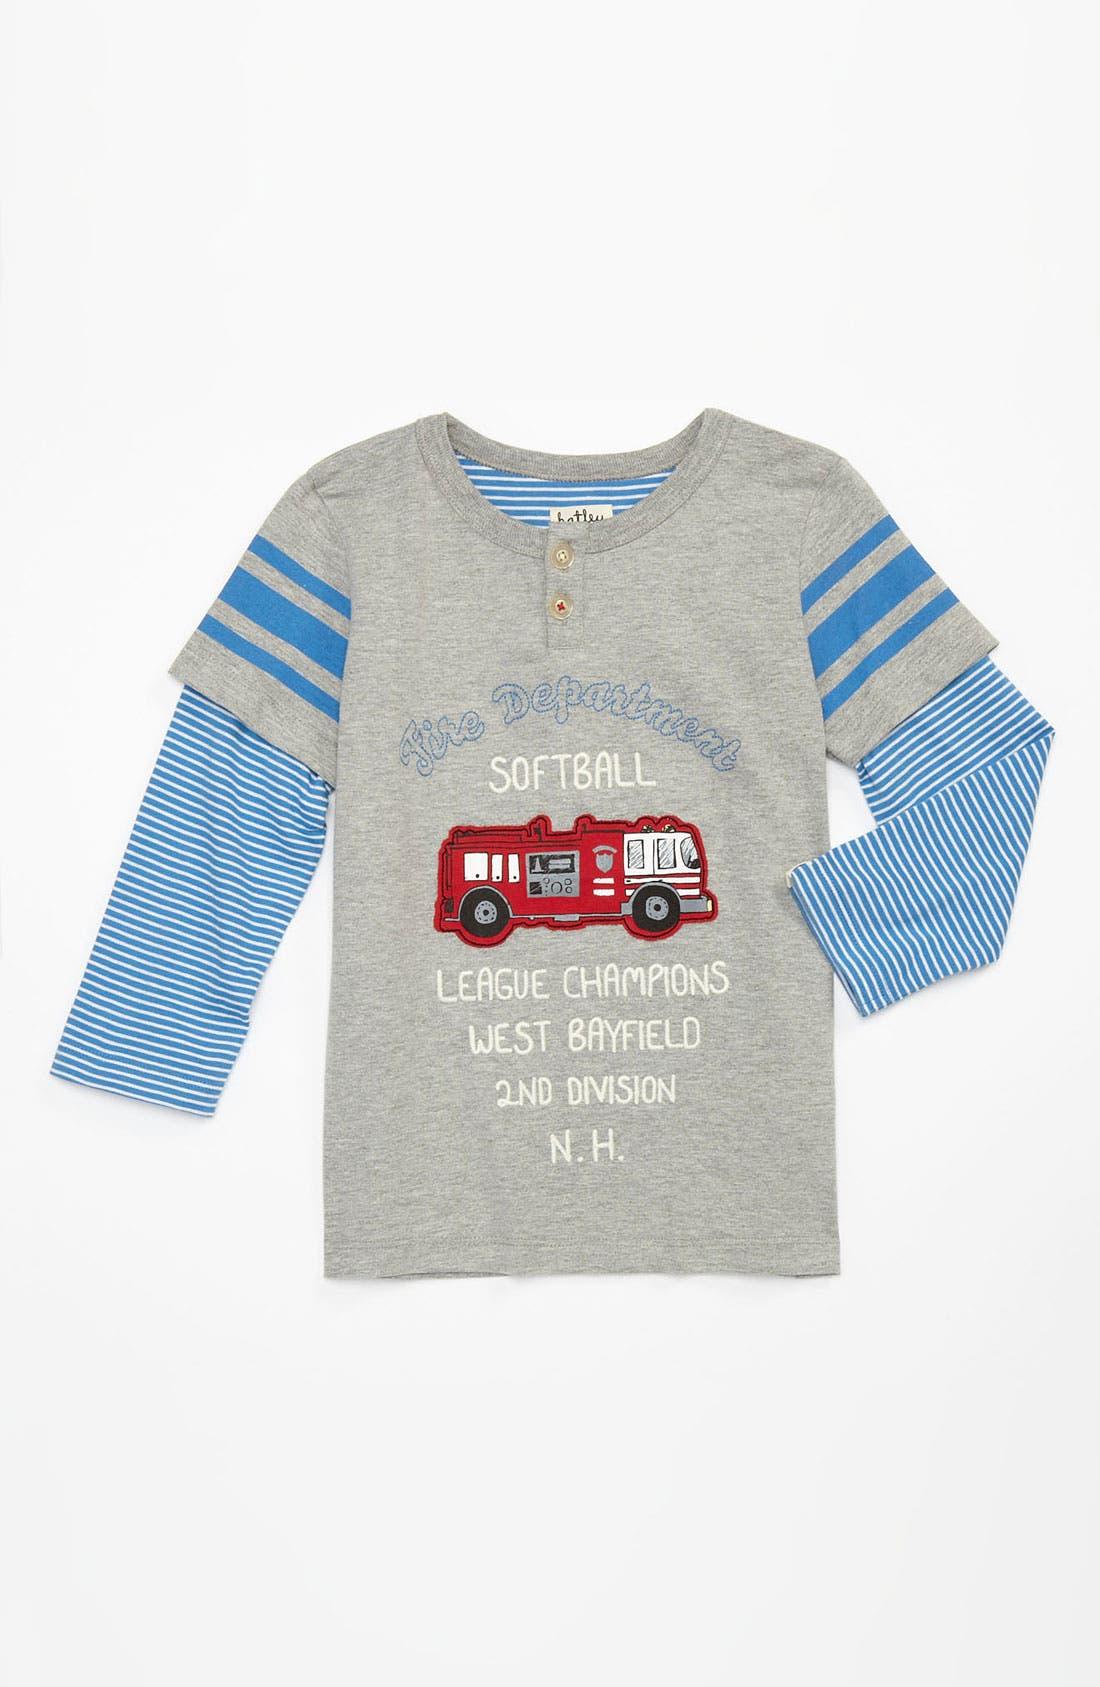 Main Image - Hatley 'Fire Department Softball' T-Shirt (Toddler)